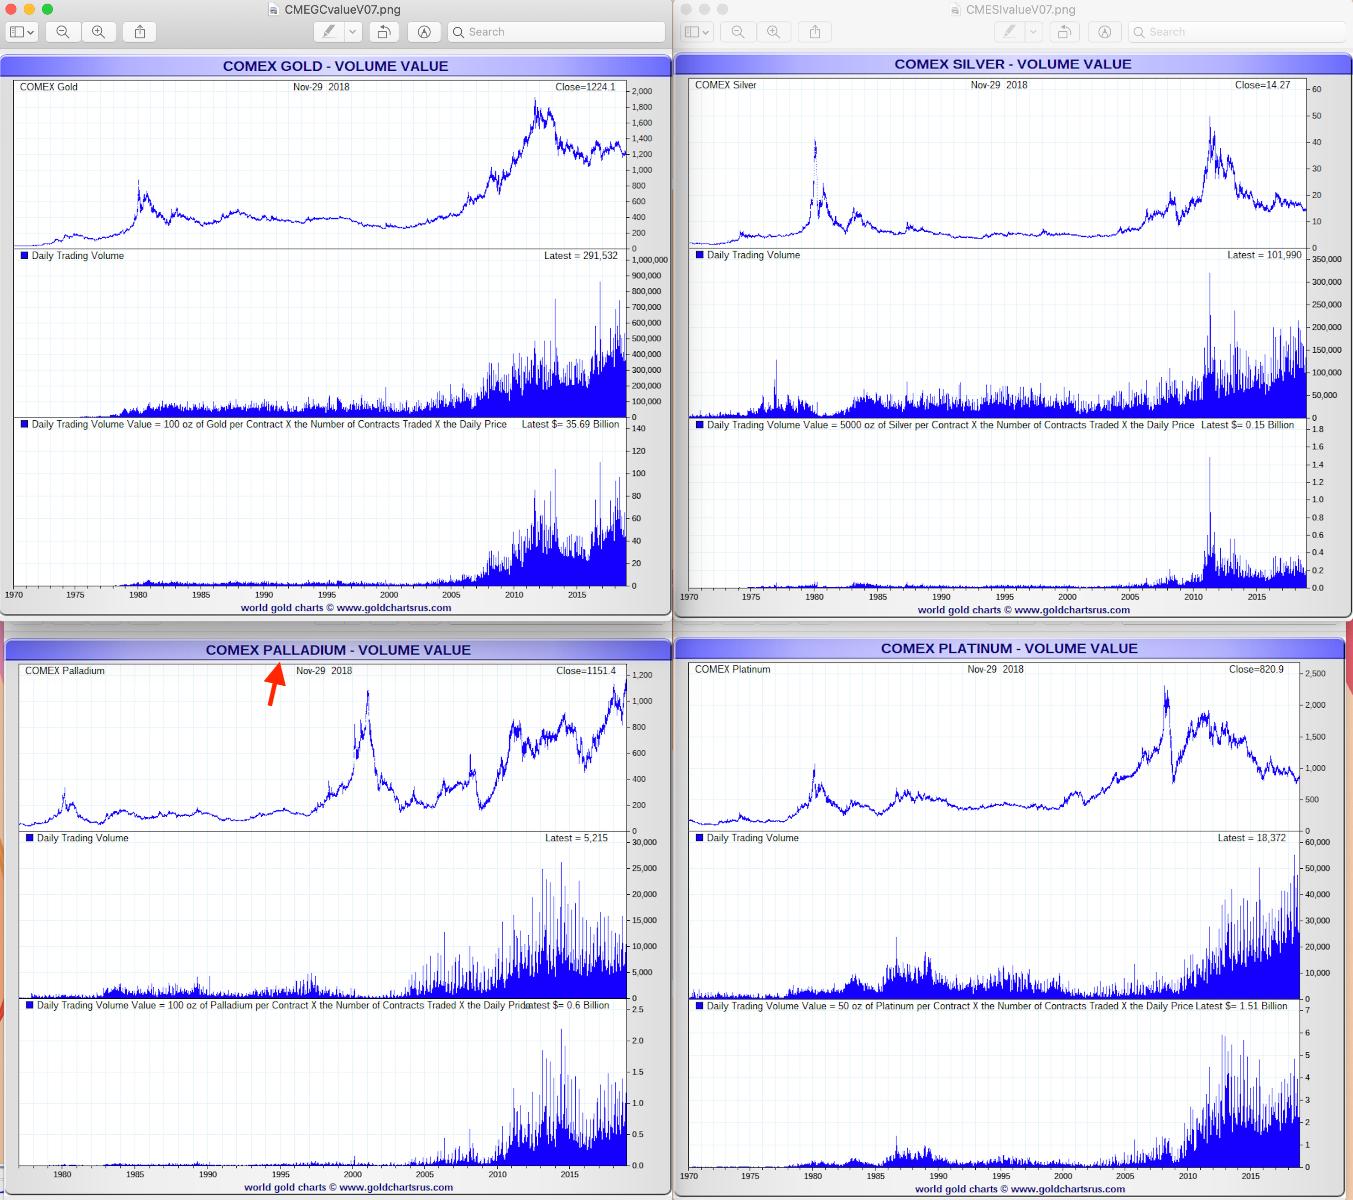 Palladium Price Record vs Gold Silver Palladium markets SD Bullion SDBullion.com